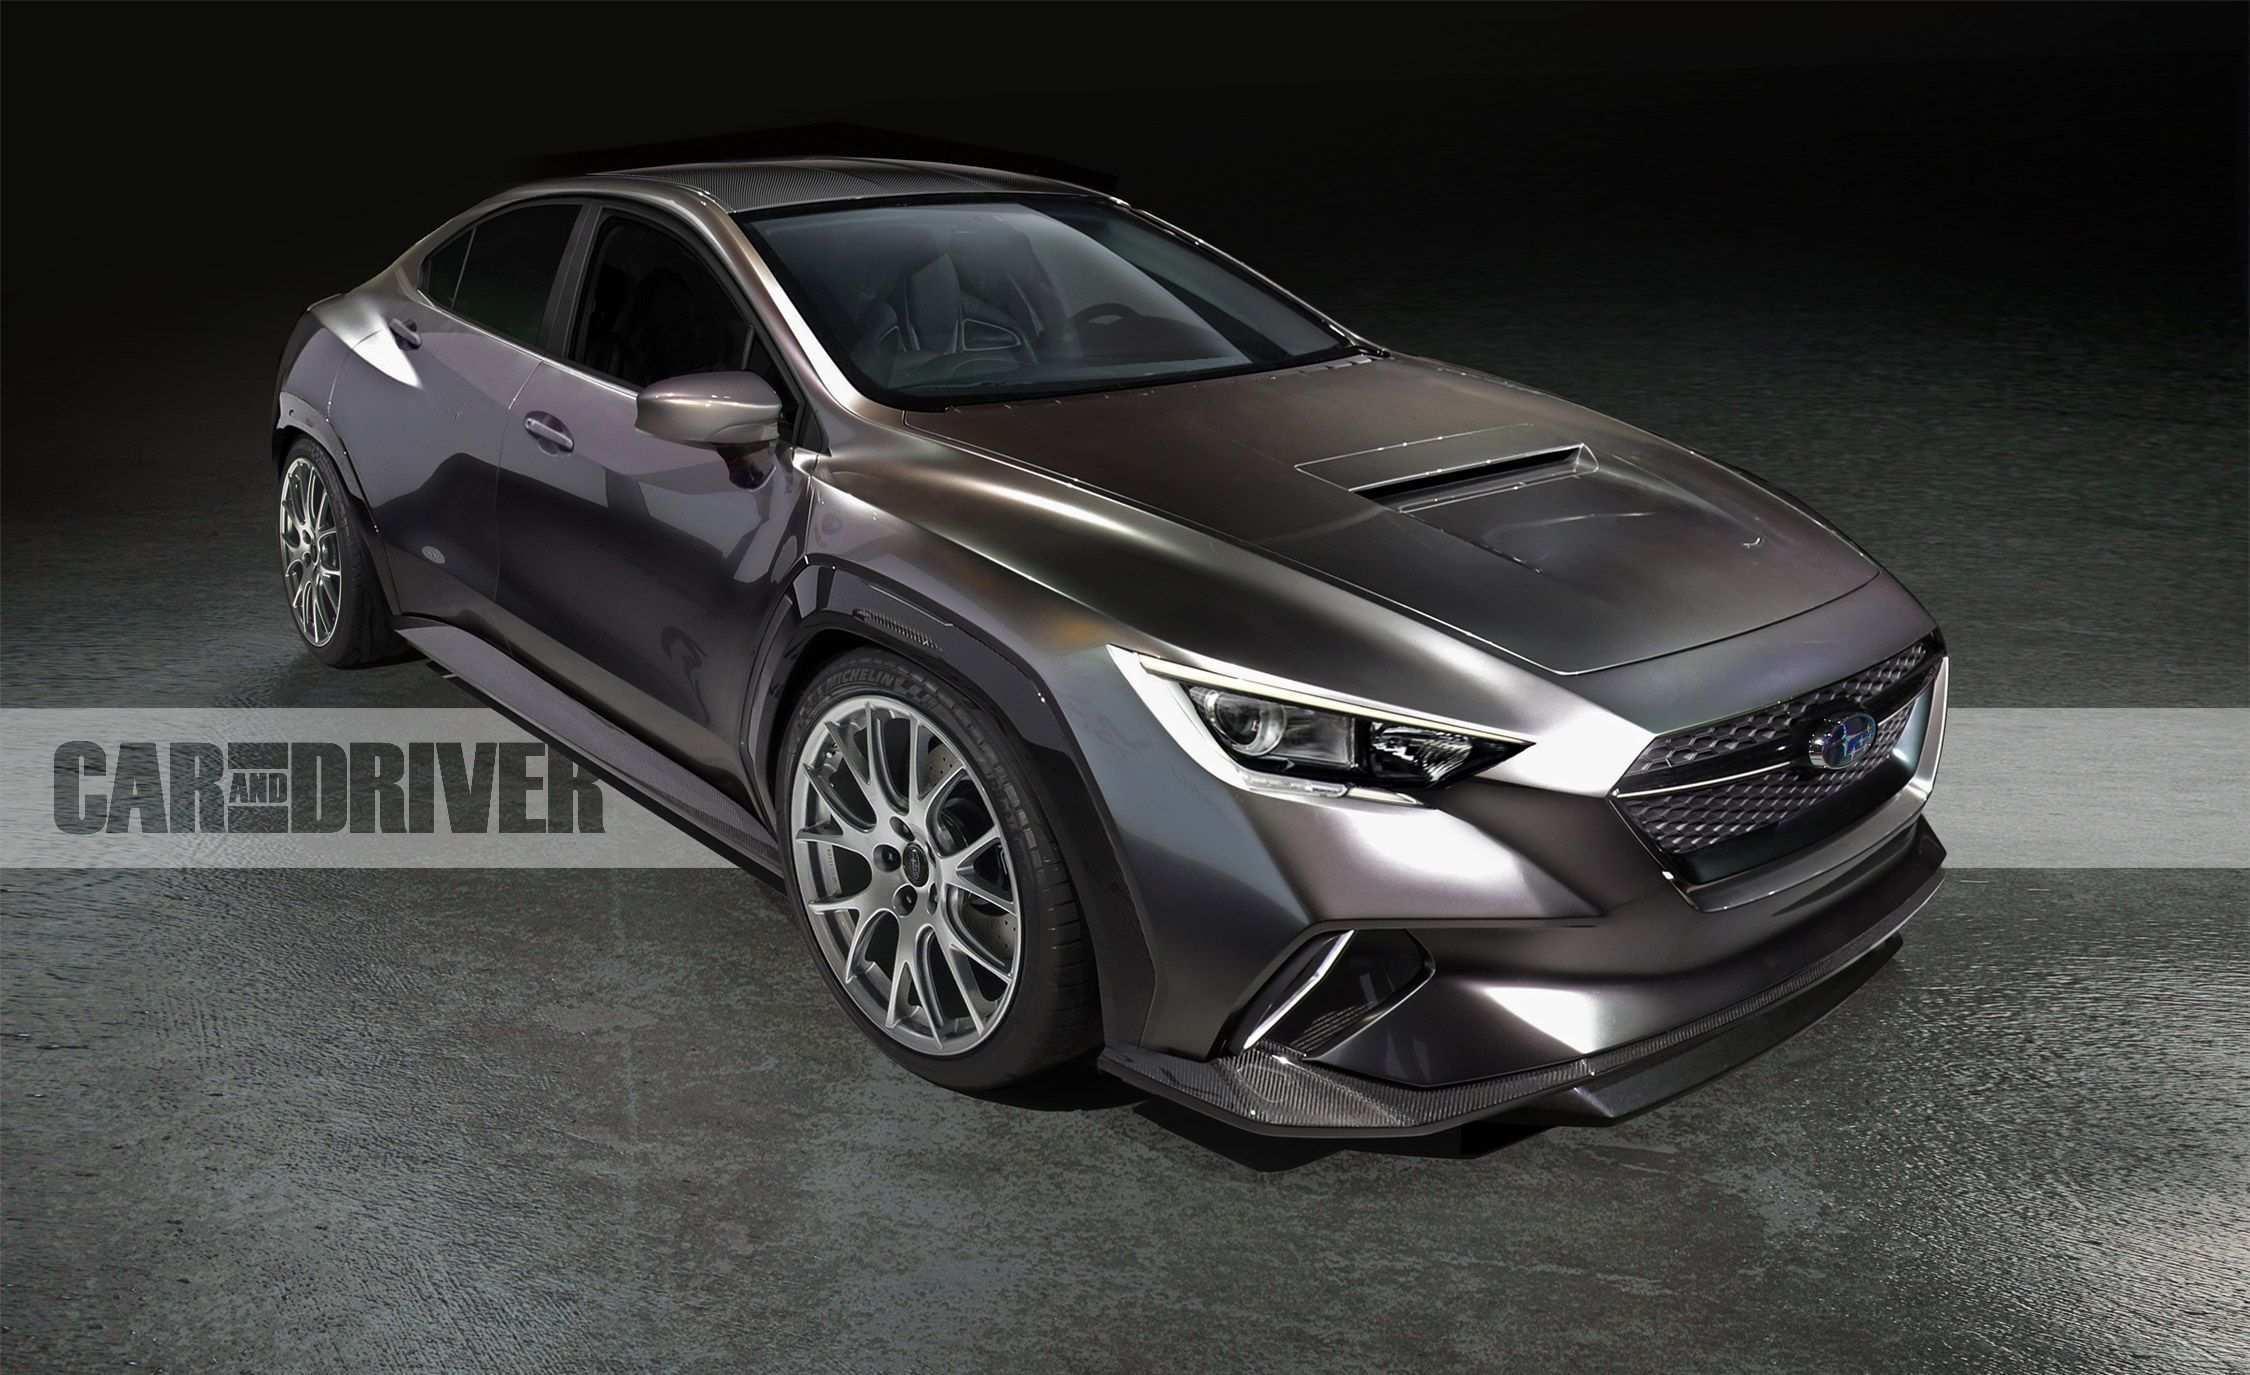 39 New 2020 Subaru Sti Specs for 2020 Subaru Sti